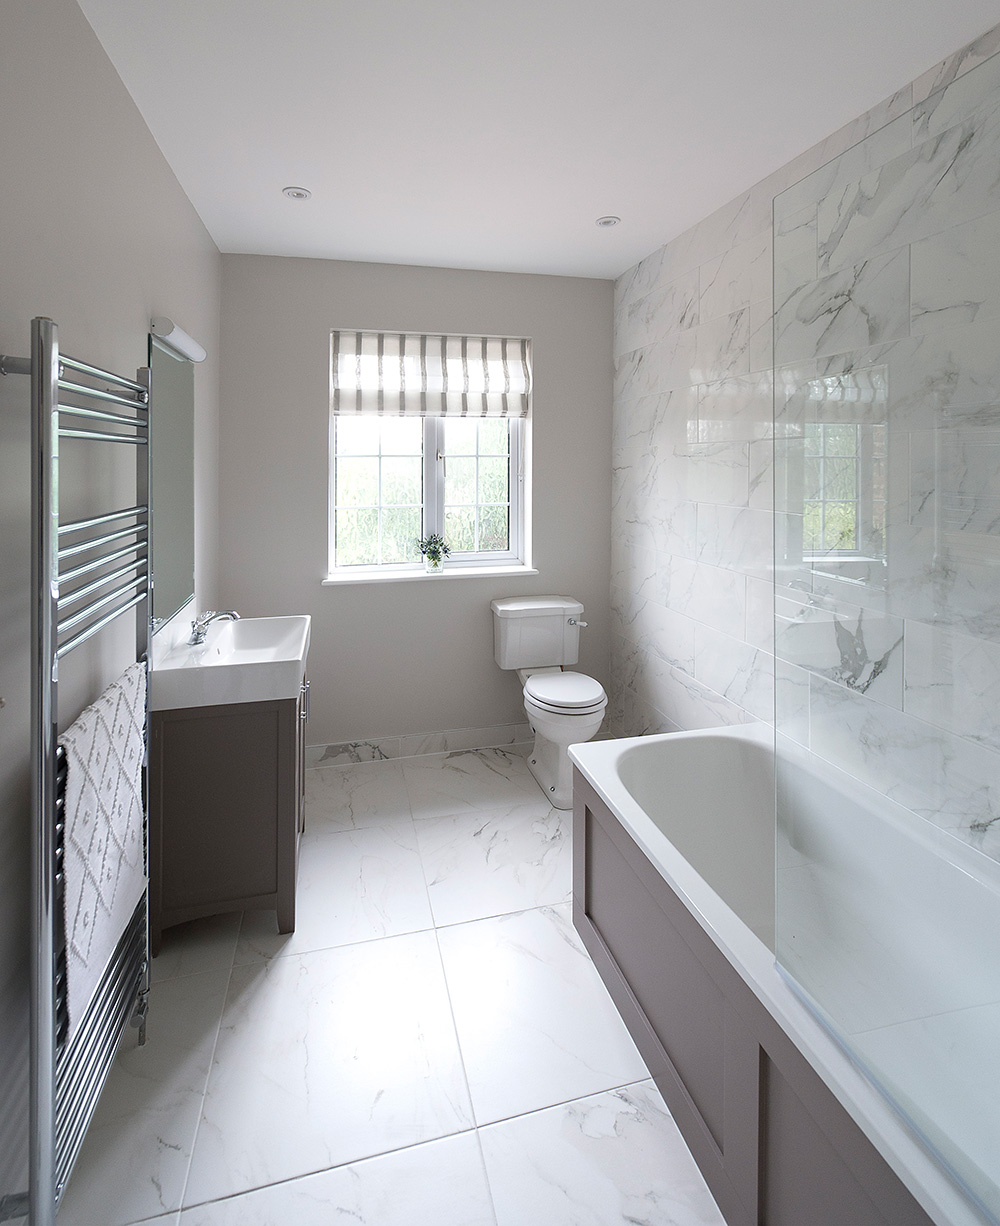 1-Nikki-Rees-Bathroom-design-Carra-marbel-renovation-interior-design-wimbledon-london-surrey-2